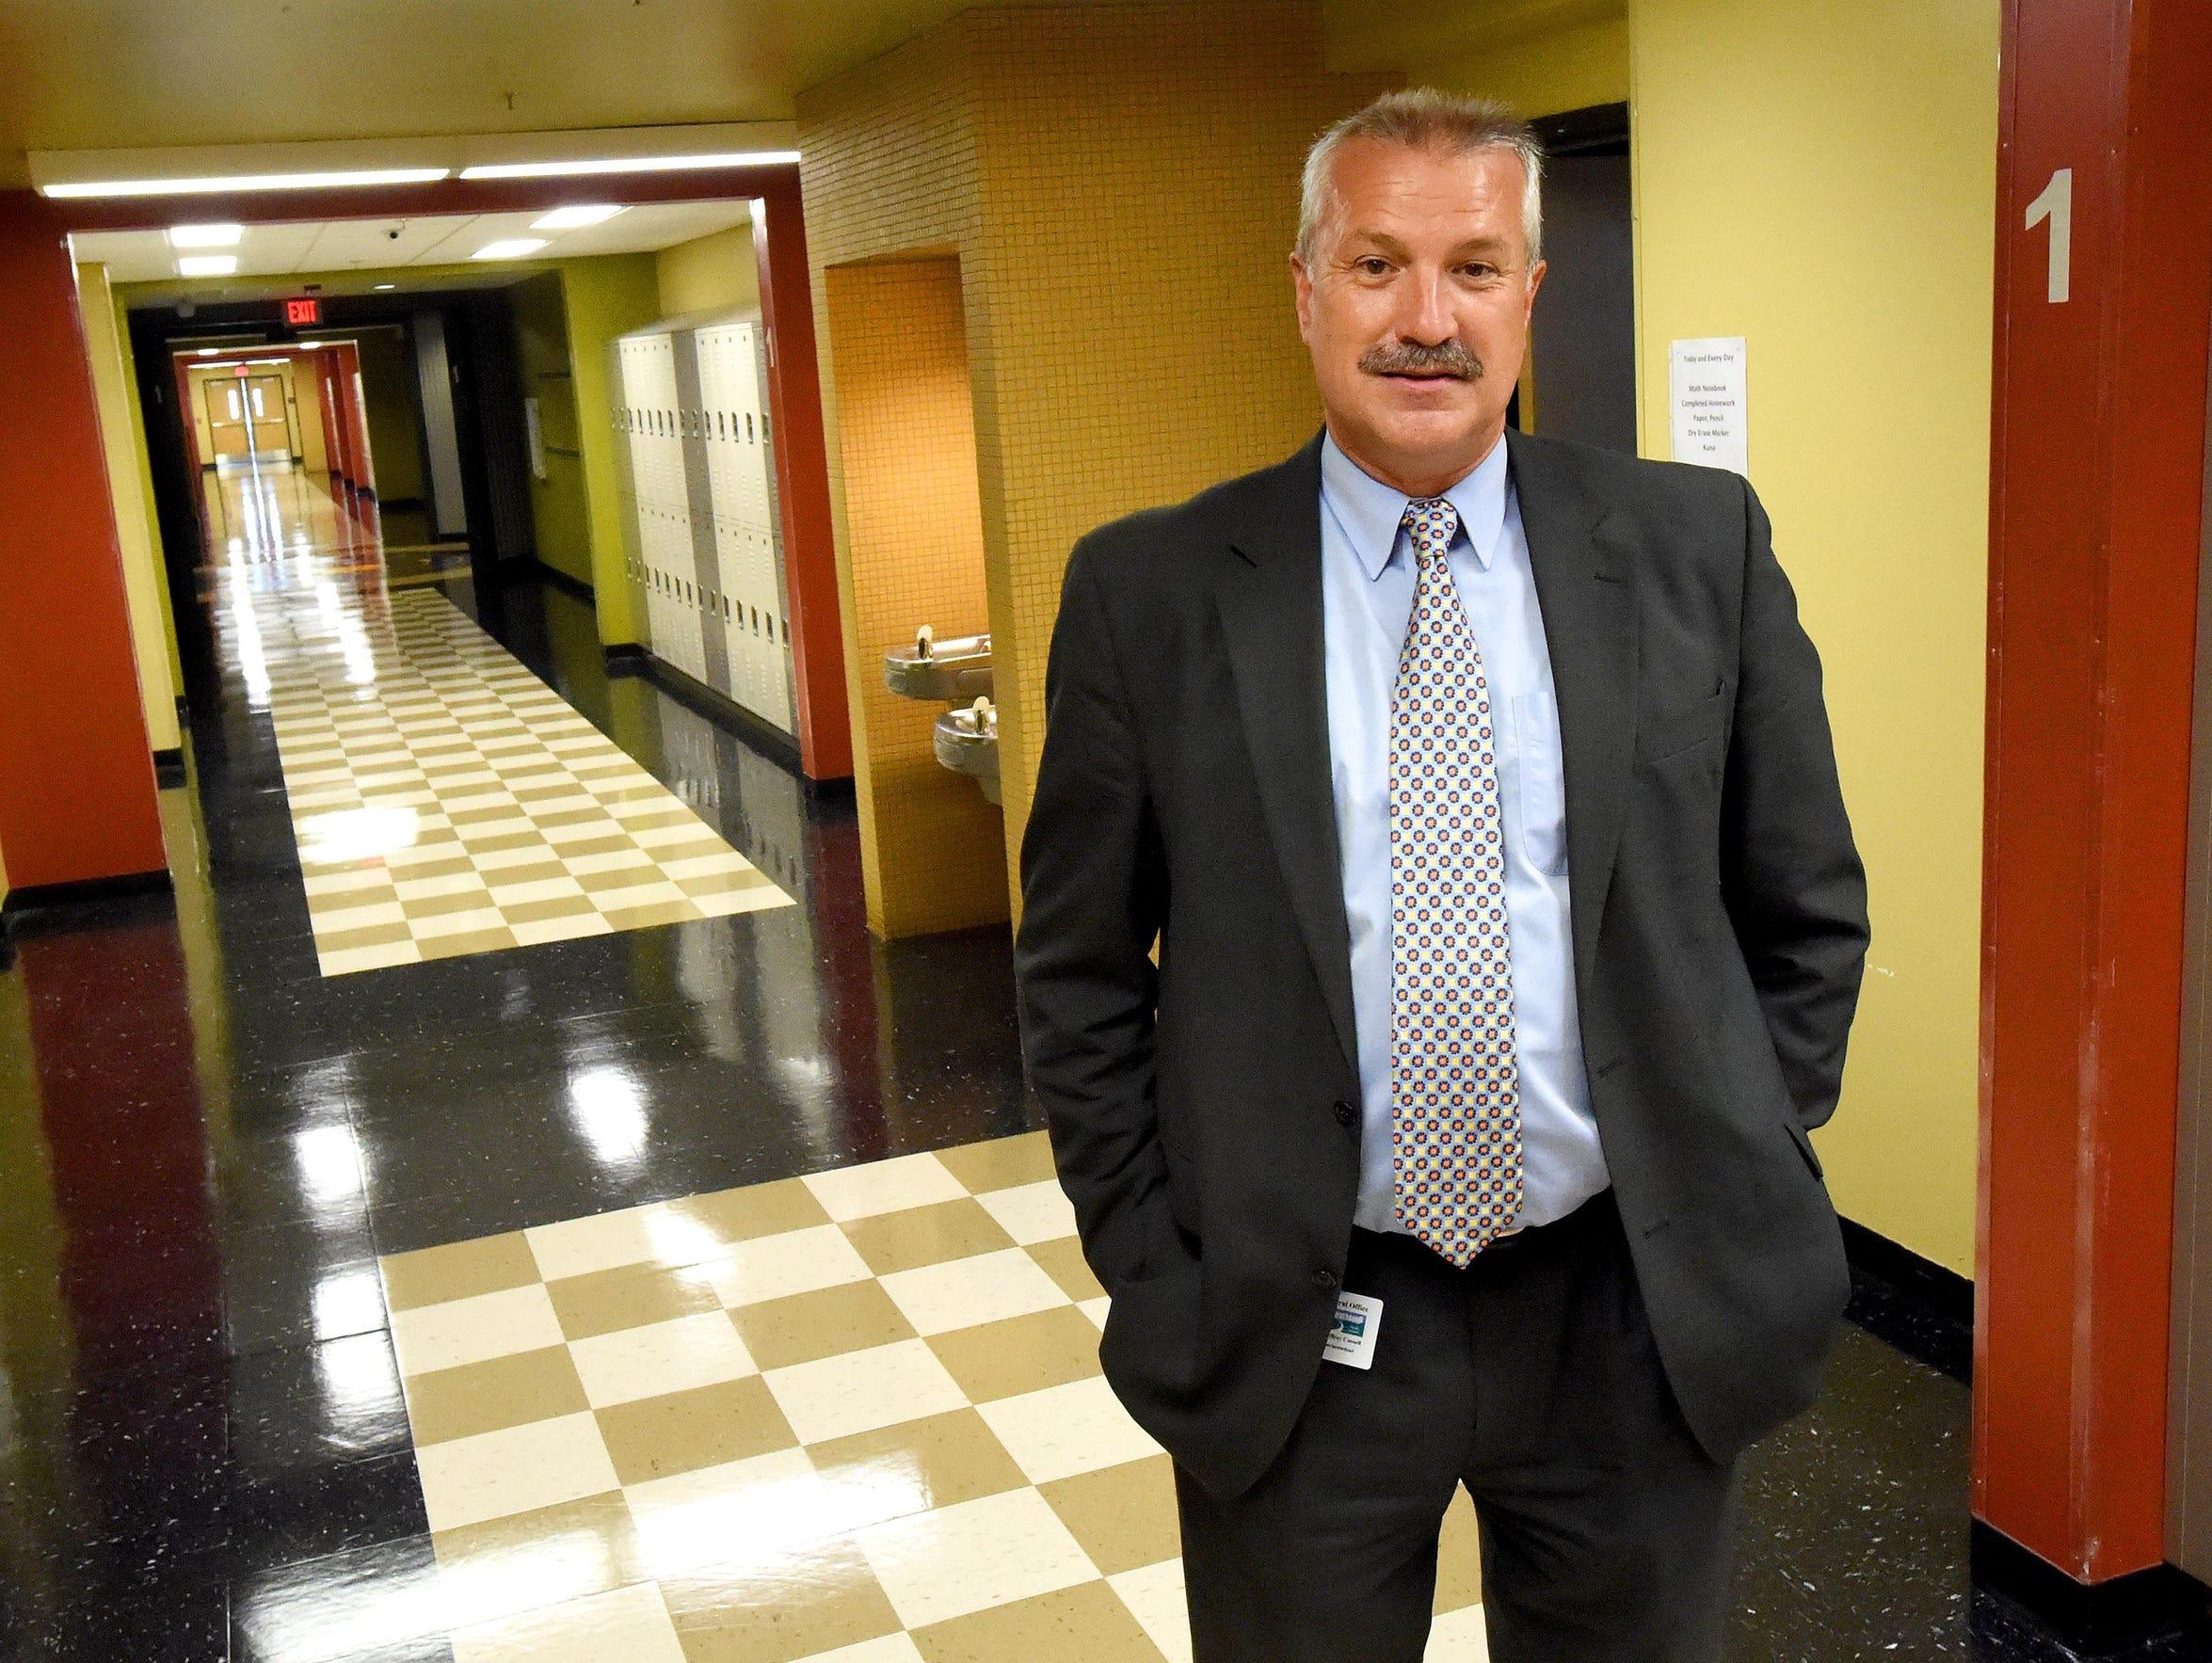 Jeffery Cassell, superintendent of Waynesboro Public